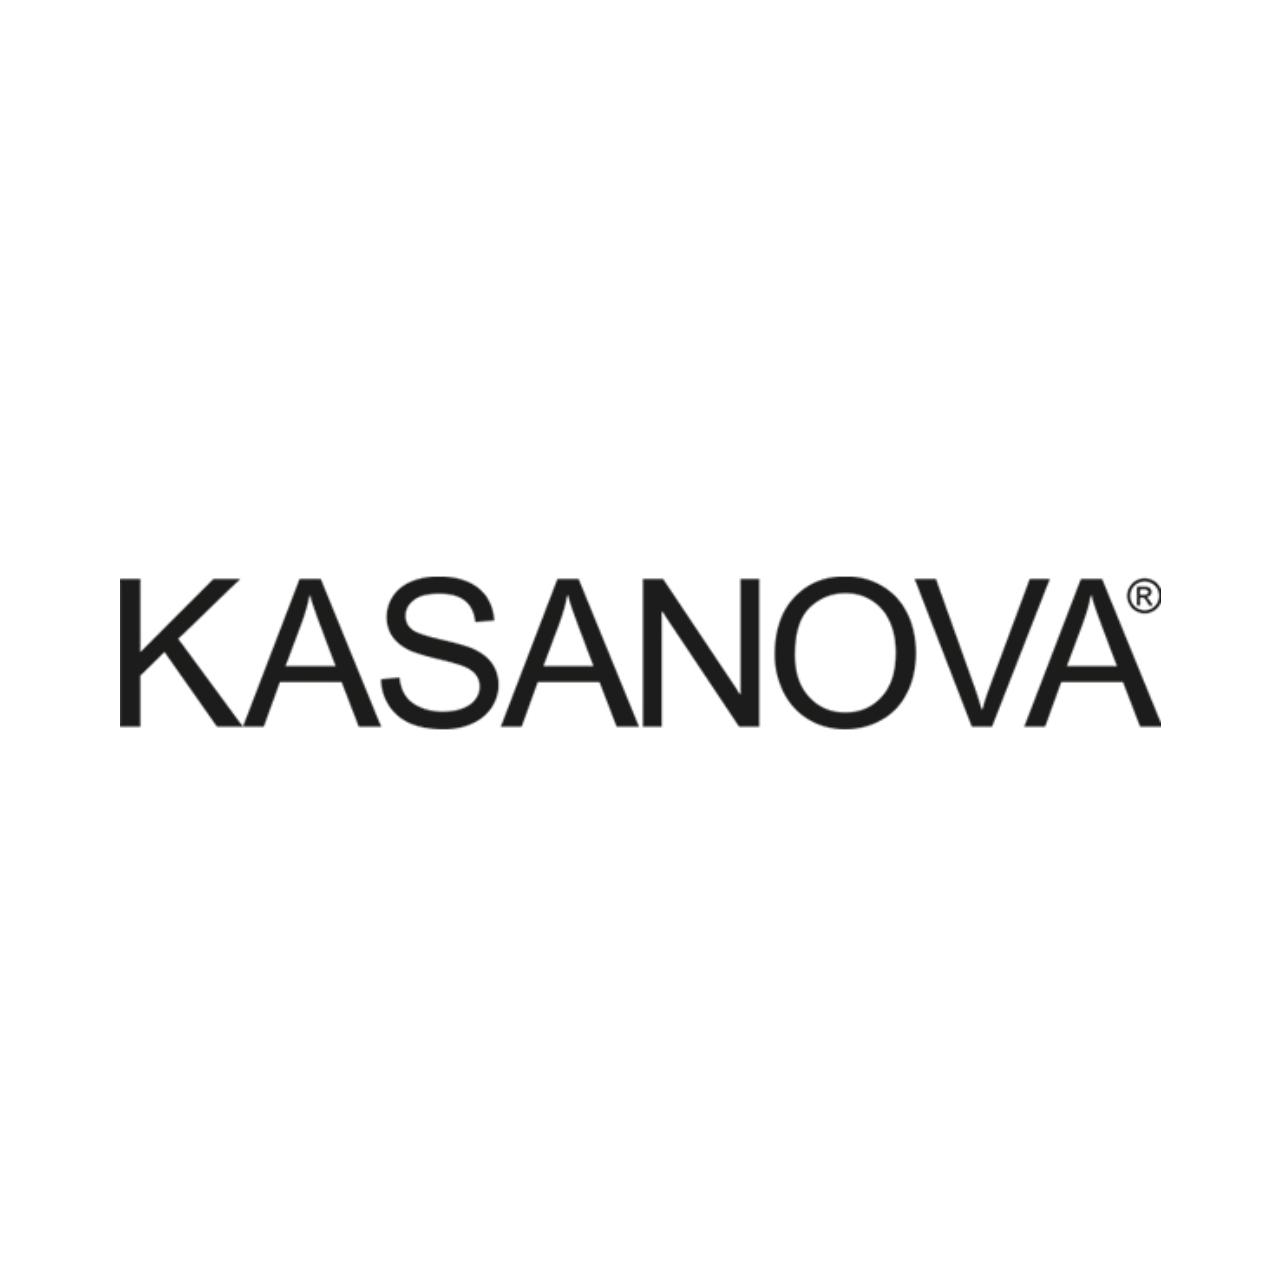 Kasanova.png